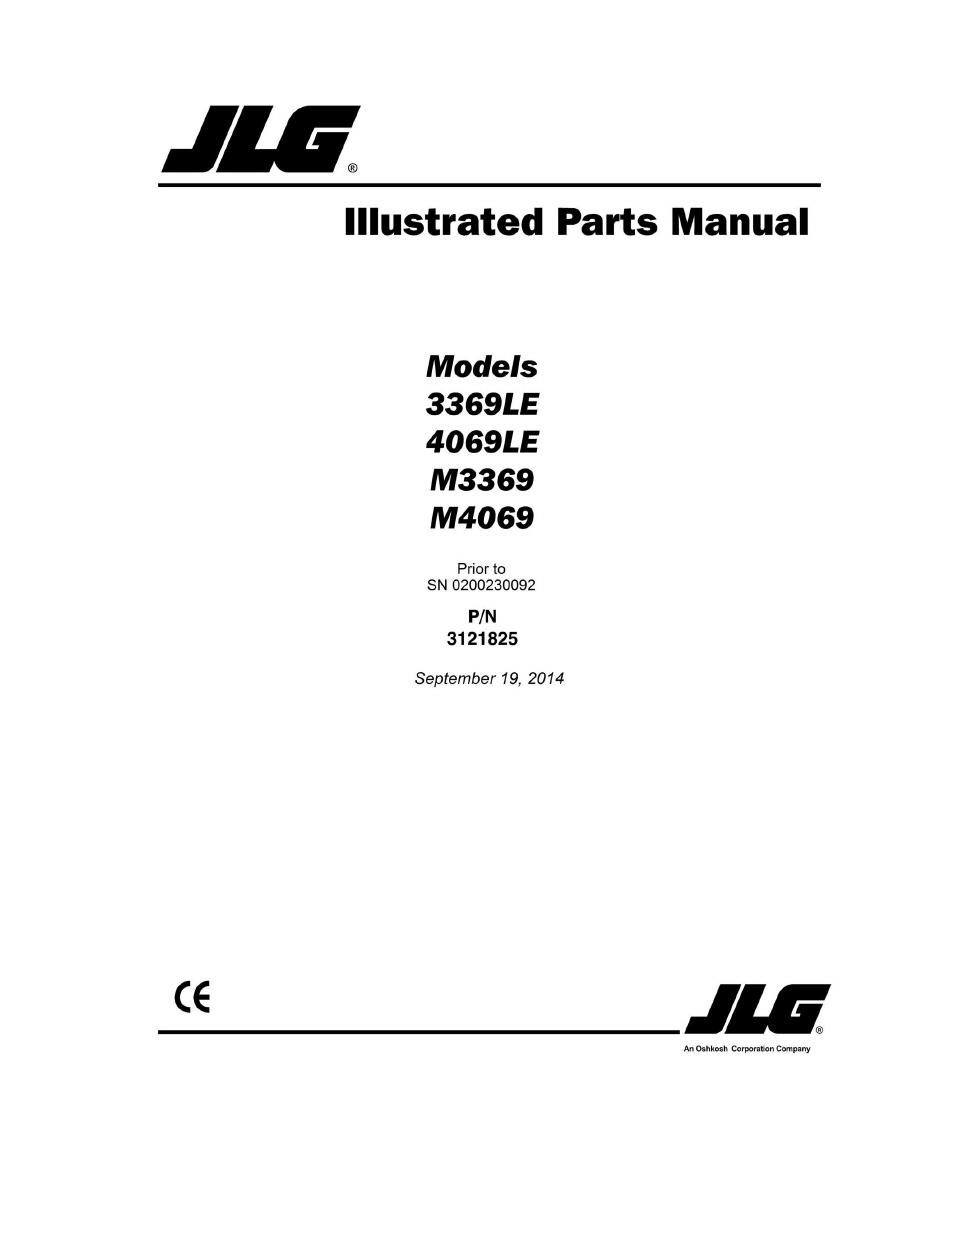 jlg parts online